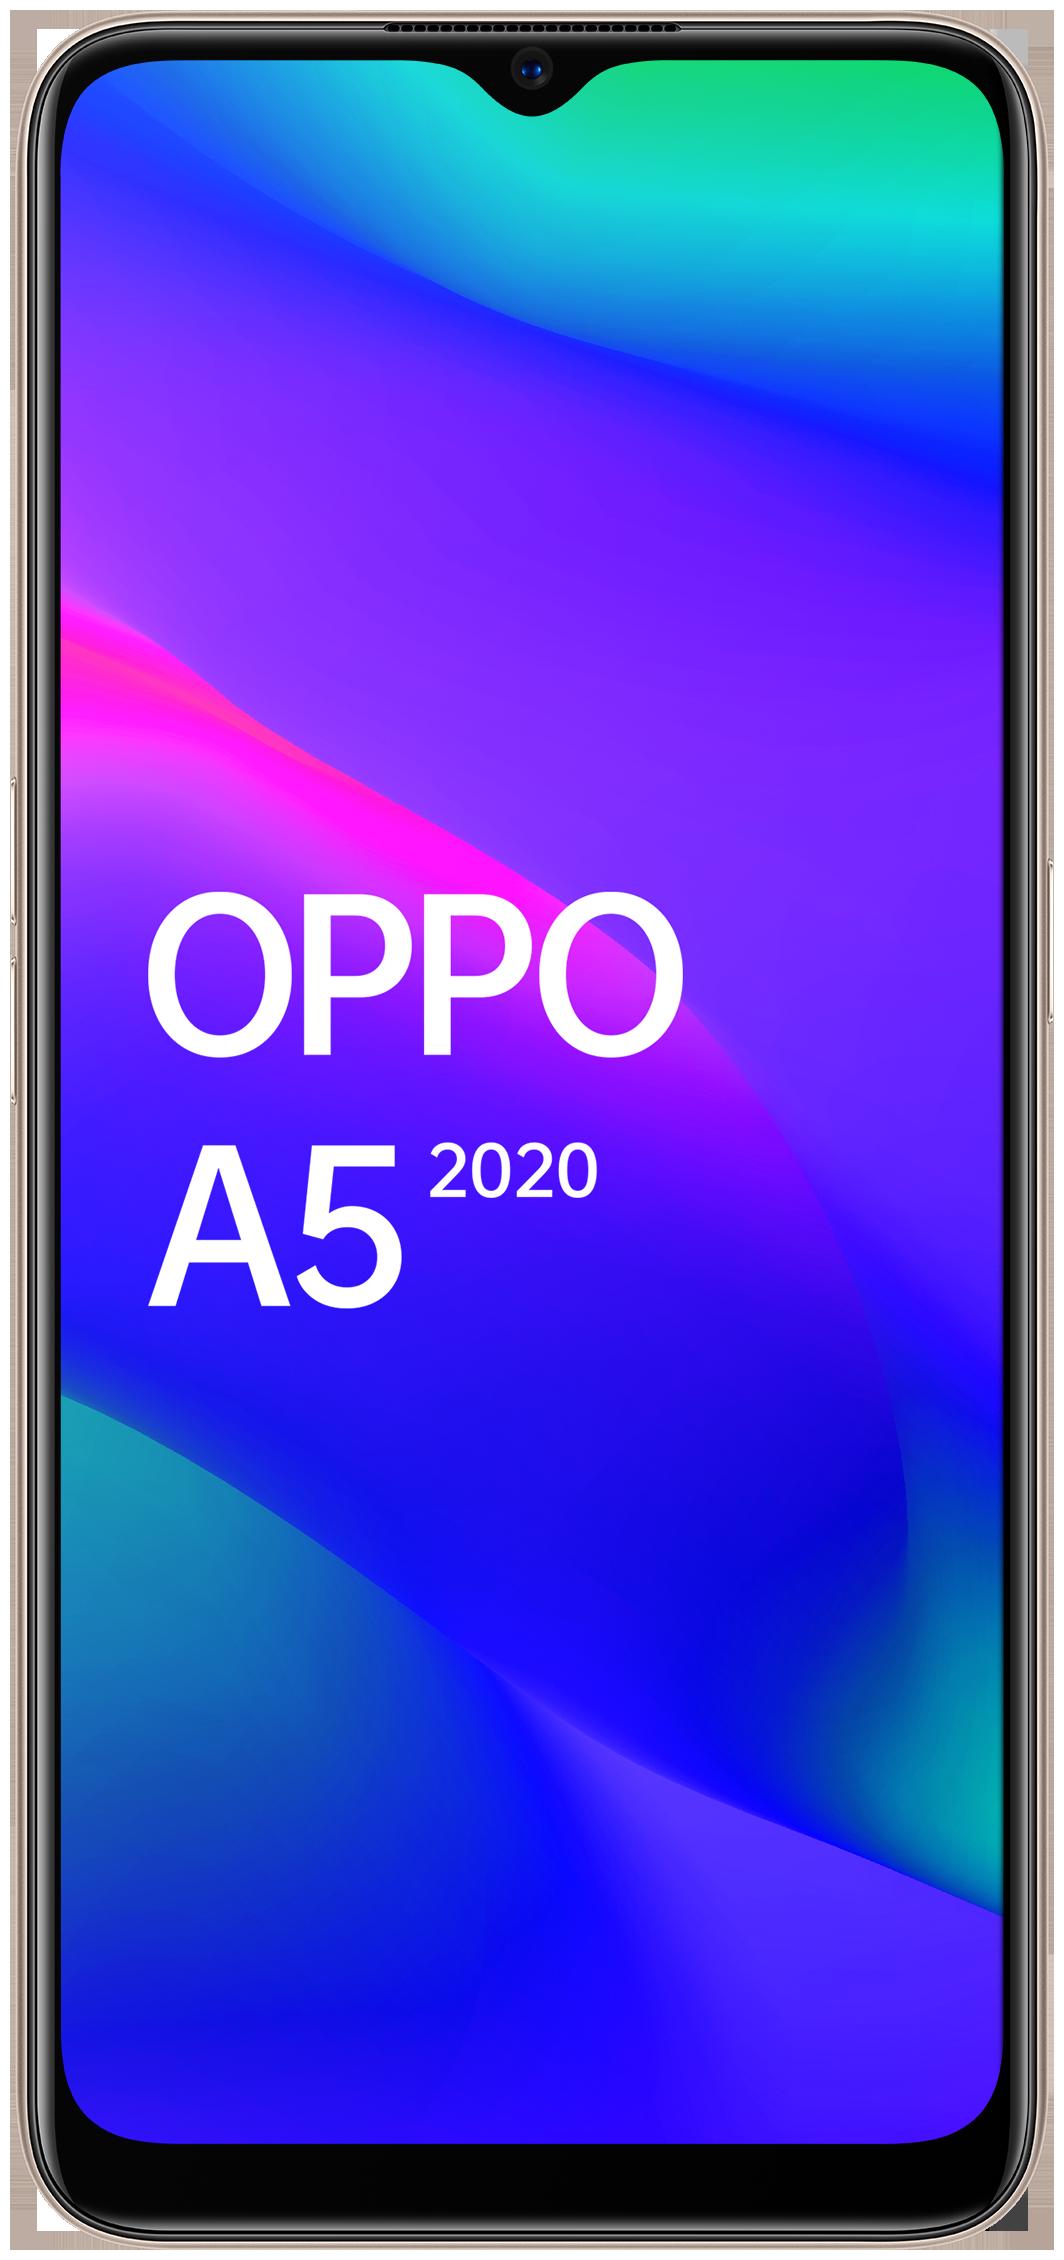 Oppo A5 2020 4 GB 64 GB Dazzling White